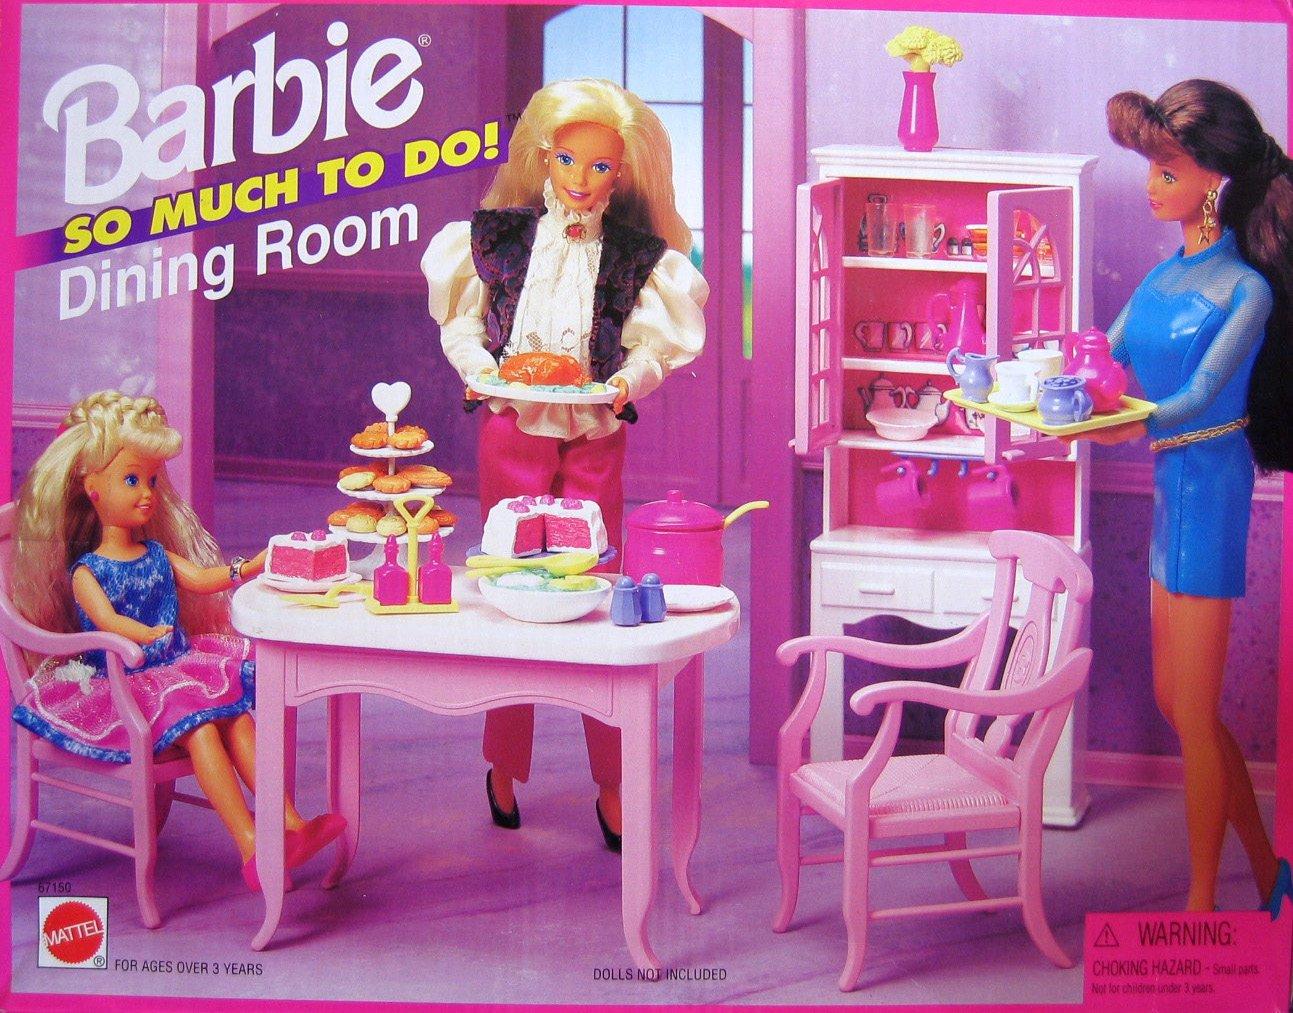 Barbie Dining Room under desk stepper : 812BV1oPfU4LSL1293 from www.twizl.co size 1293 x 1013 jpeg 295kB